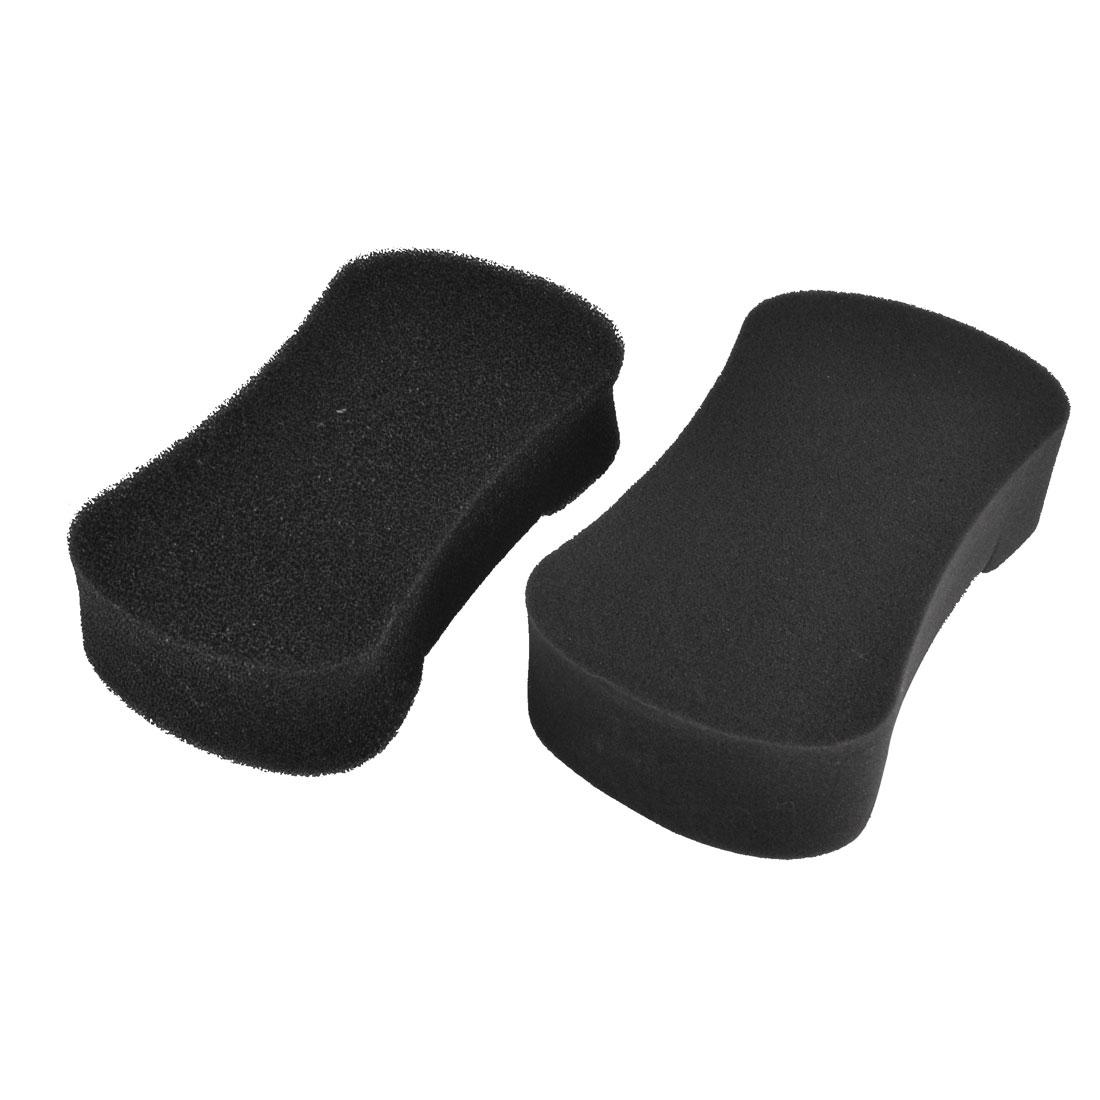 2 Pcs Black Bone Shape Soft Sponge Car Glass Washing Cleaning Pad Cushion